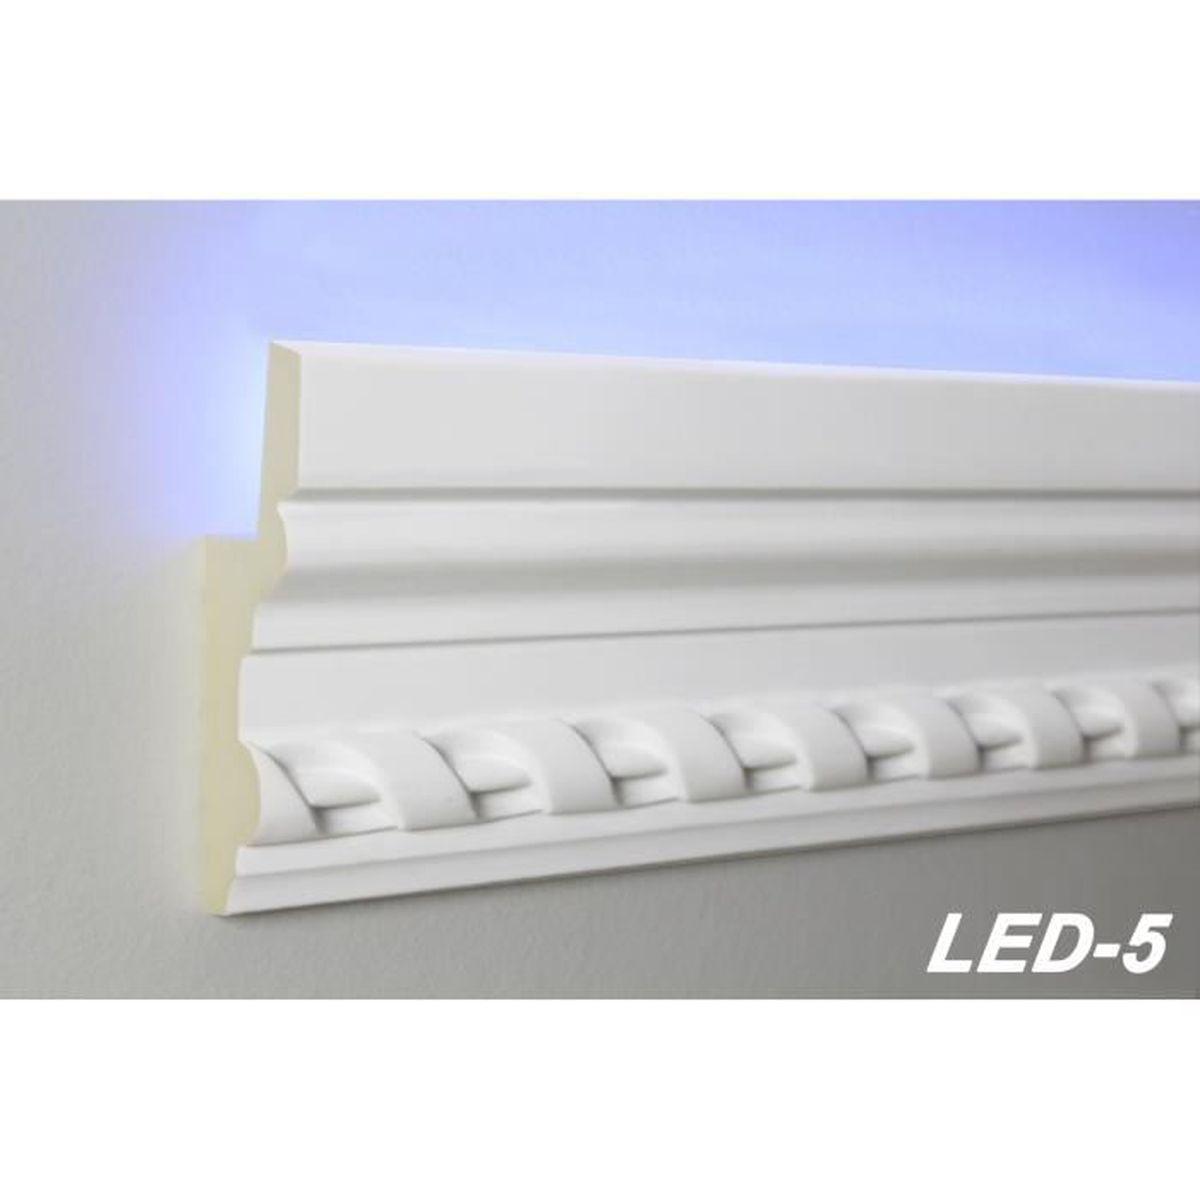 Corniche Polystyrène Pour Led corniche de plafond Éclairage indirect led-5 - achat / vente